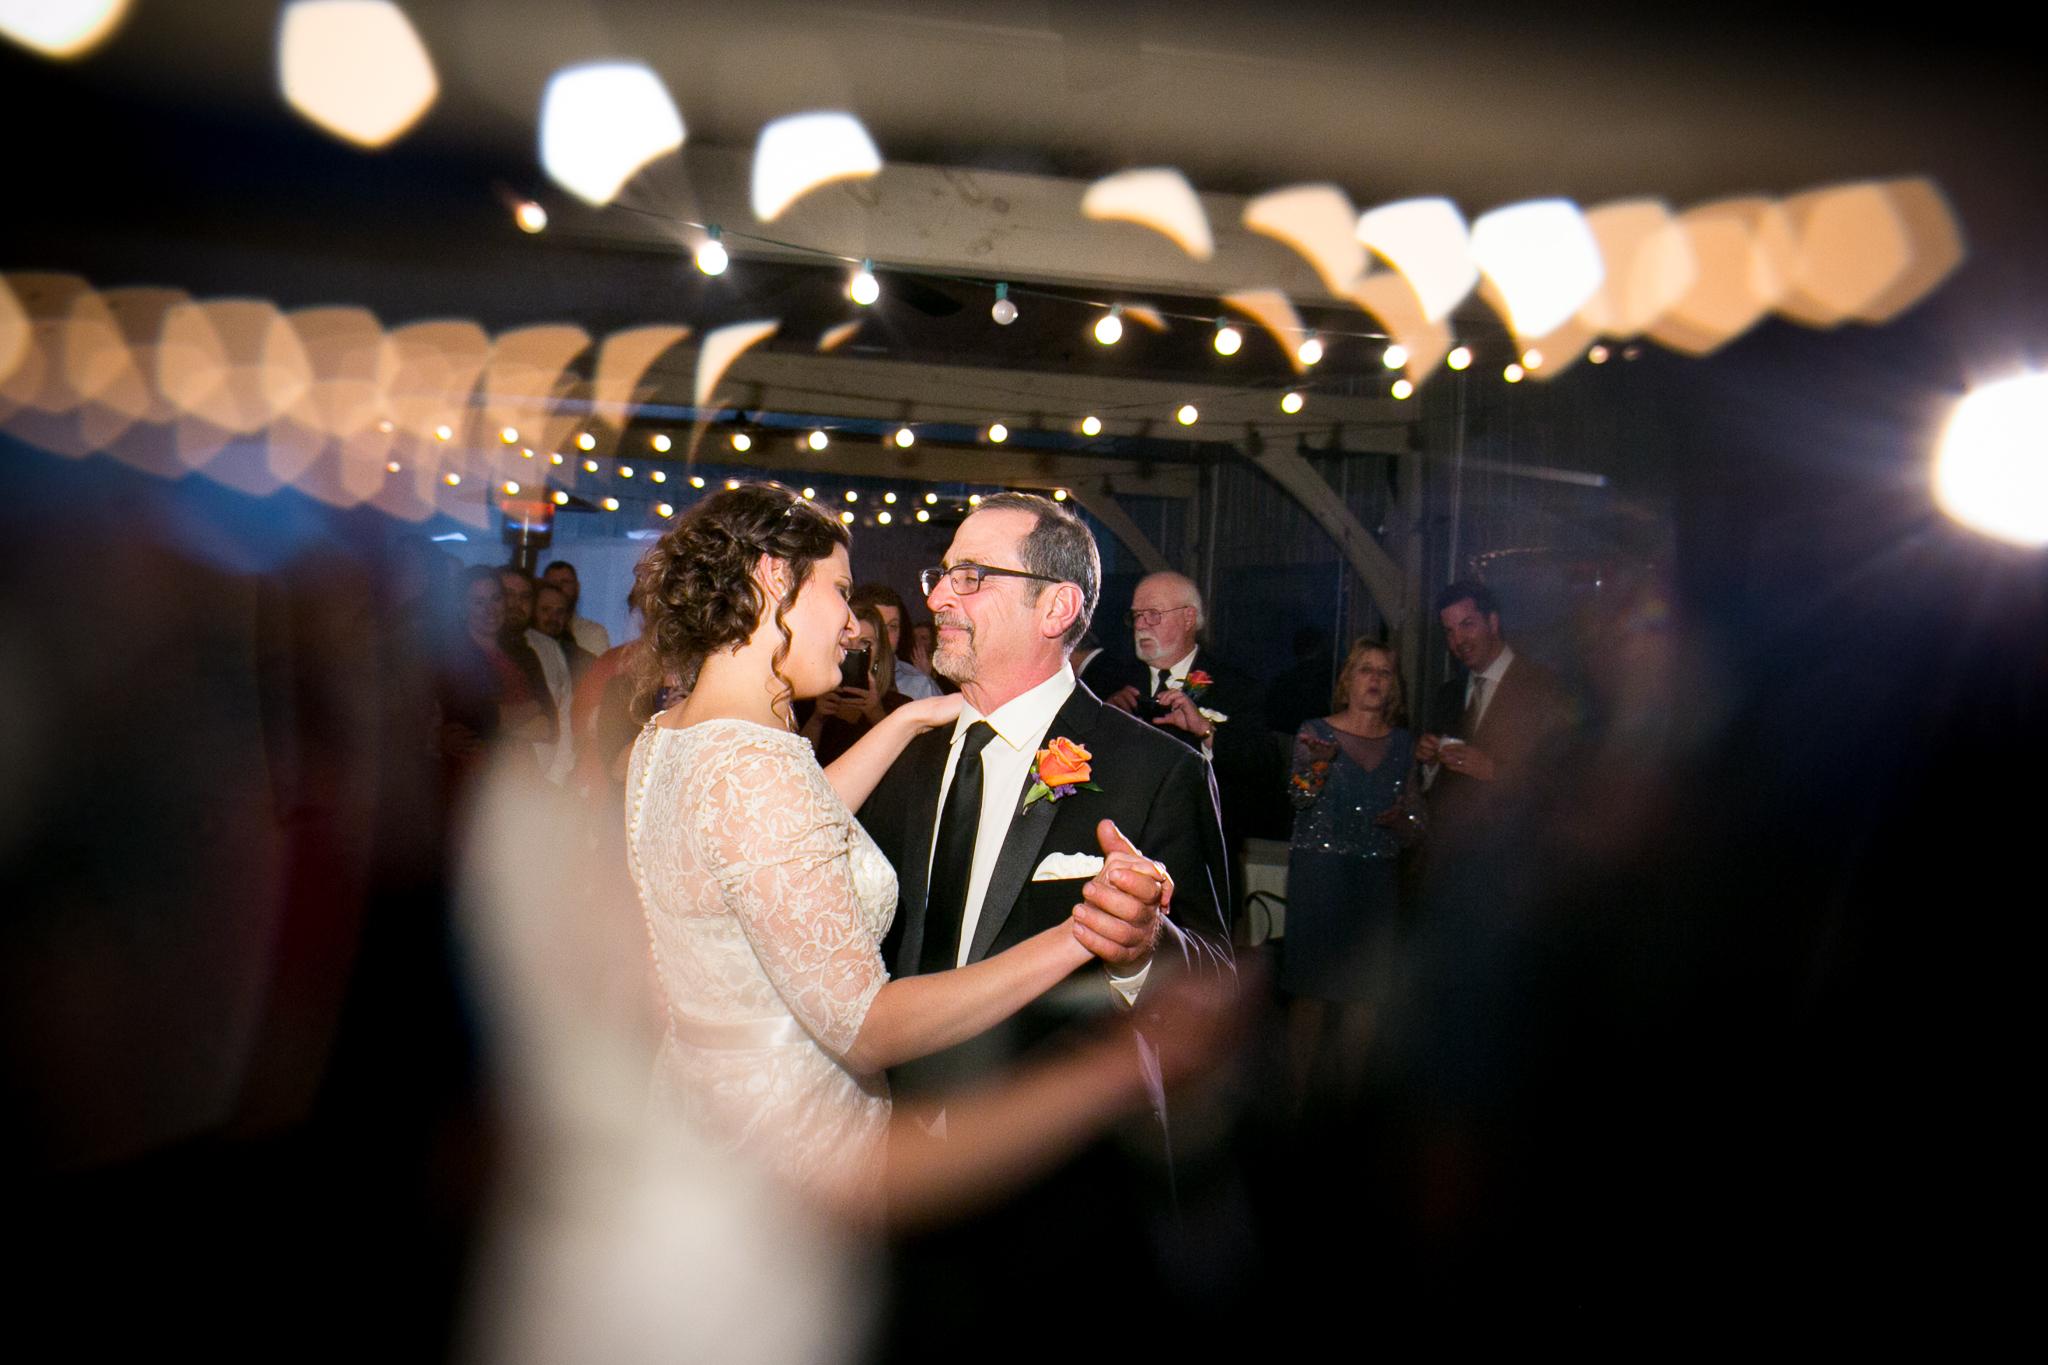 camuglia-whomstudio-chelsea_and_andy-nycphotographer-wedding-brooklyn-buffalo-timberlodge-121-5614.jpg